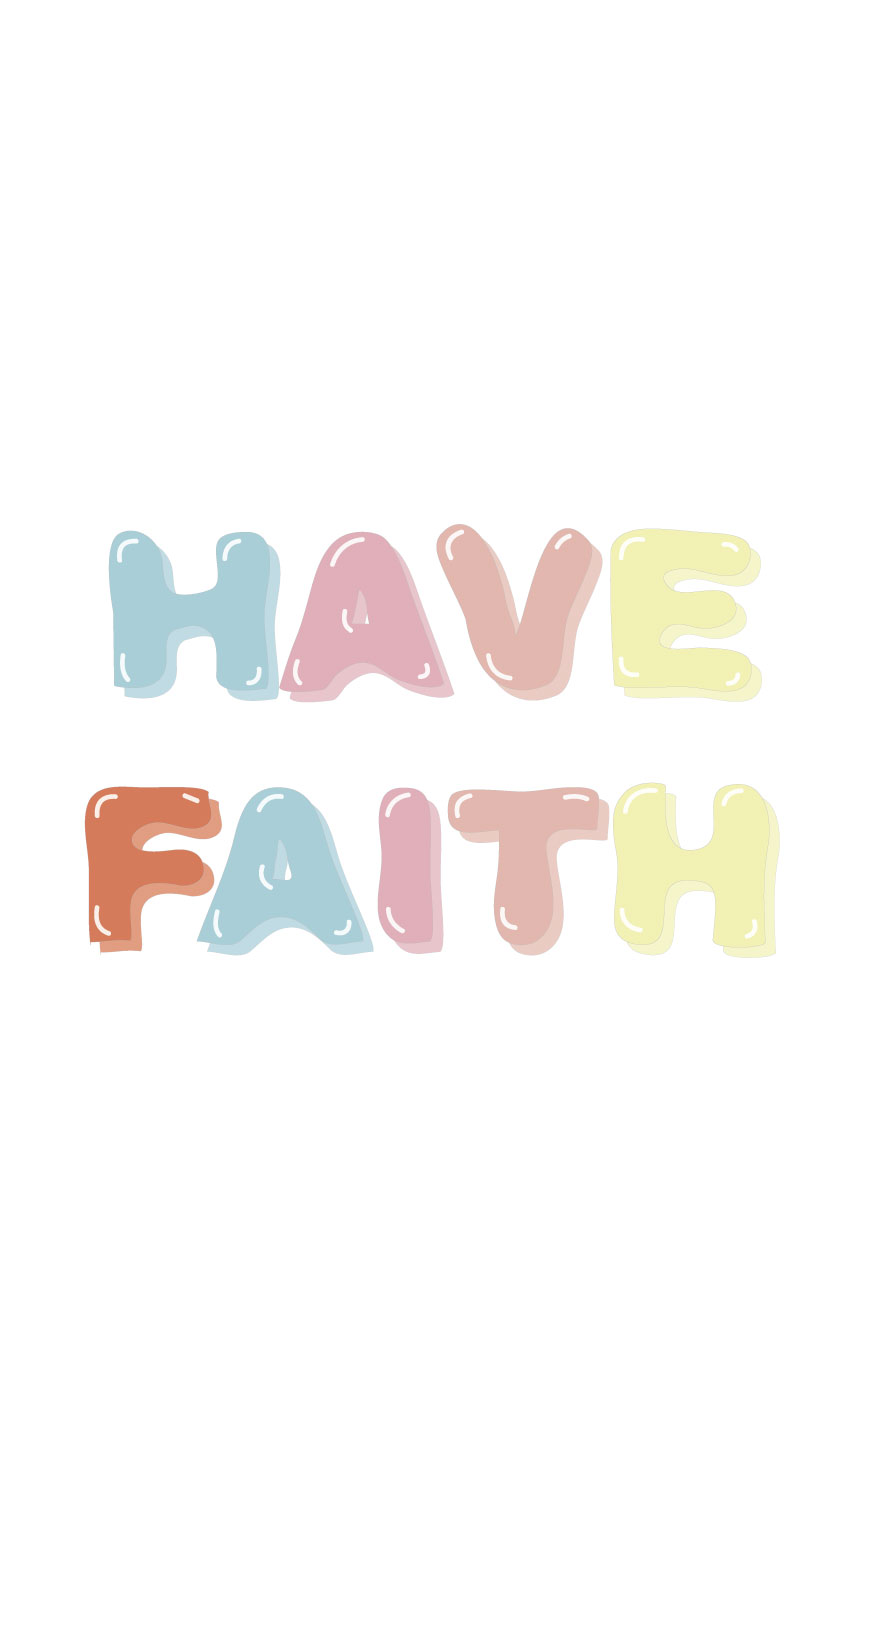 Have Faith iphone screensaver